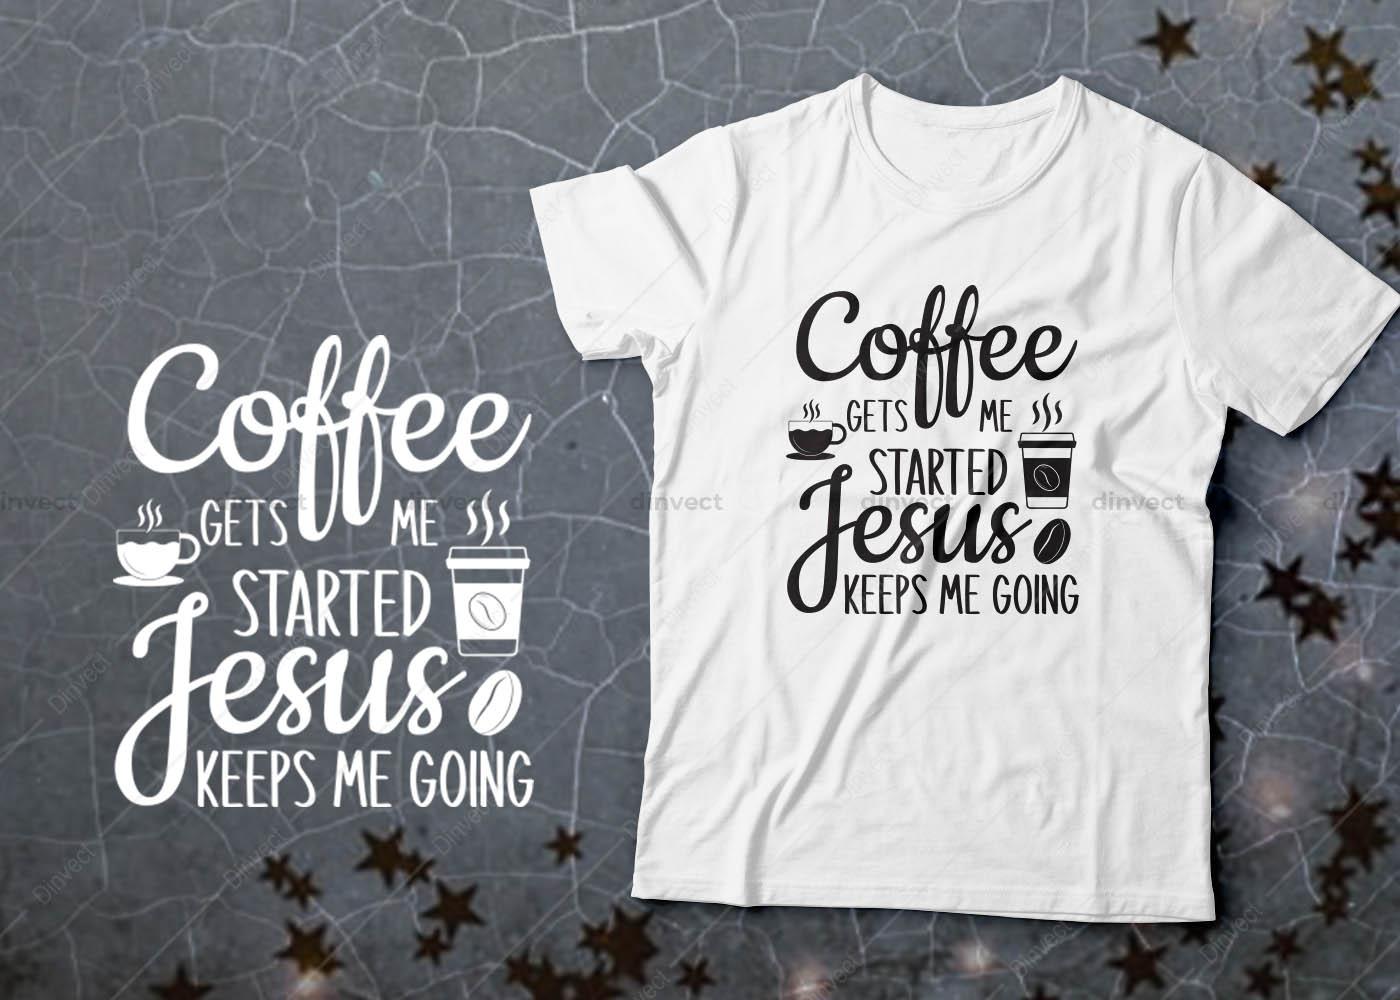 Coffee SVG, Coffee Bundle Svg, Coffee Mug Svg, Funny Coffee Quotes SVG, Mug Design Svg, Coffee Quote - Coffee 9 -